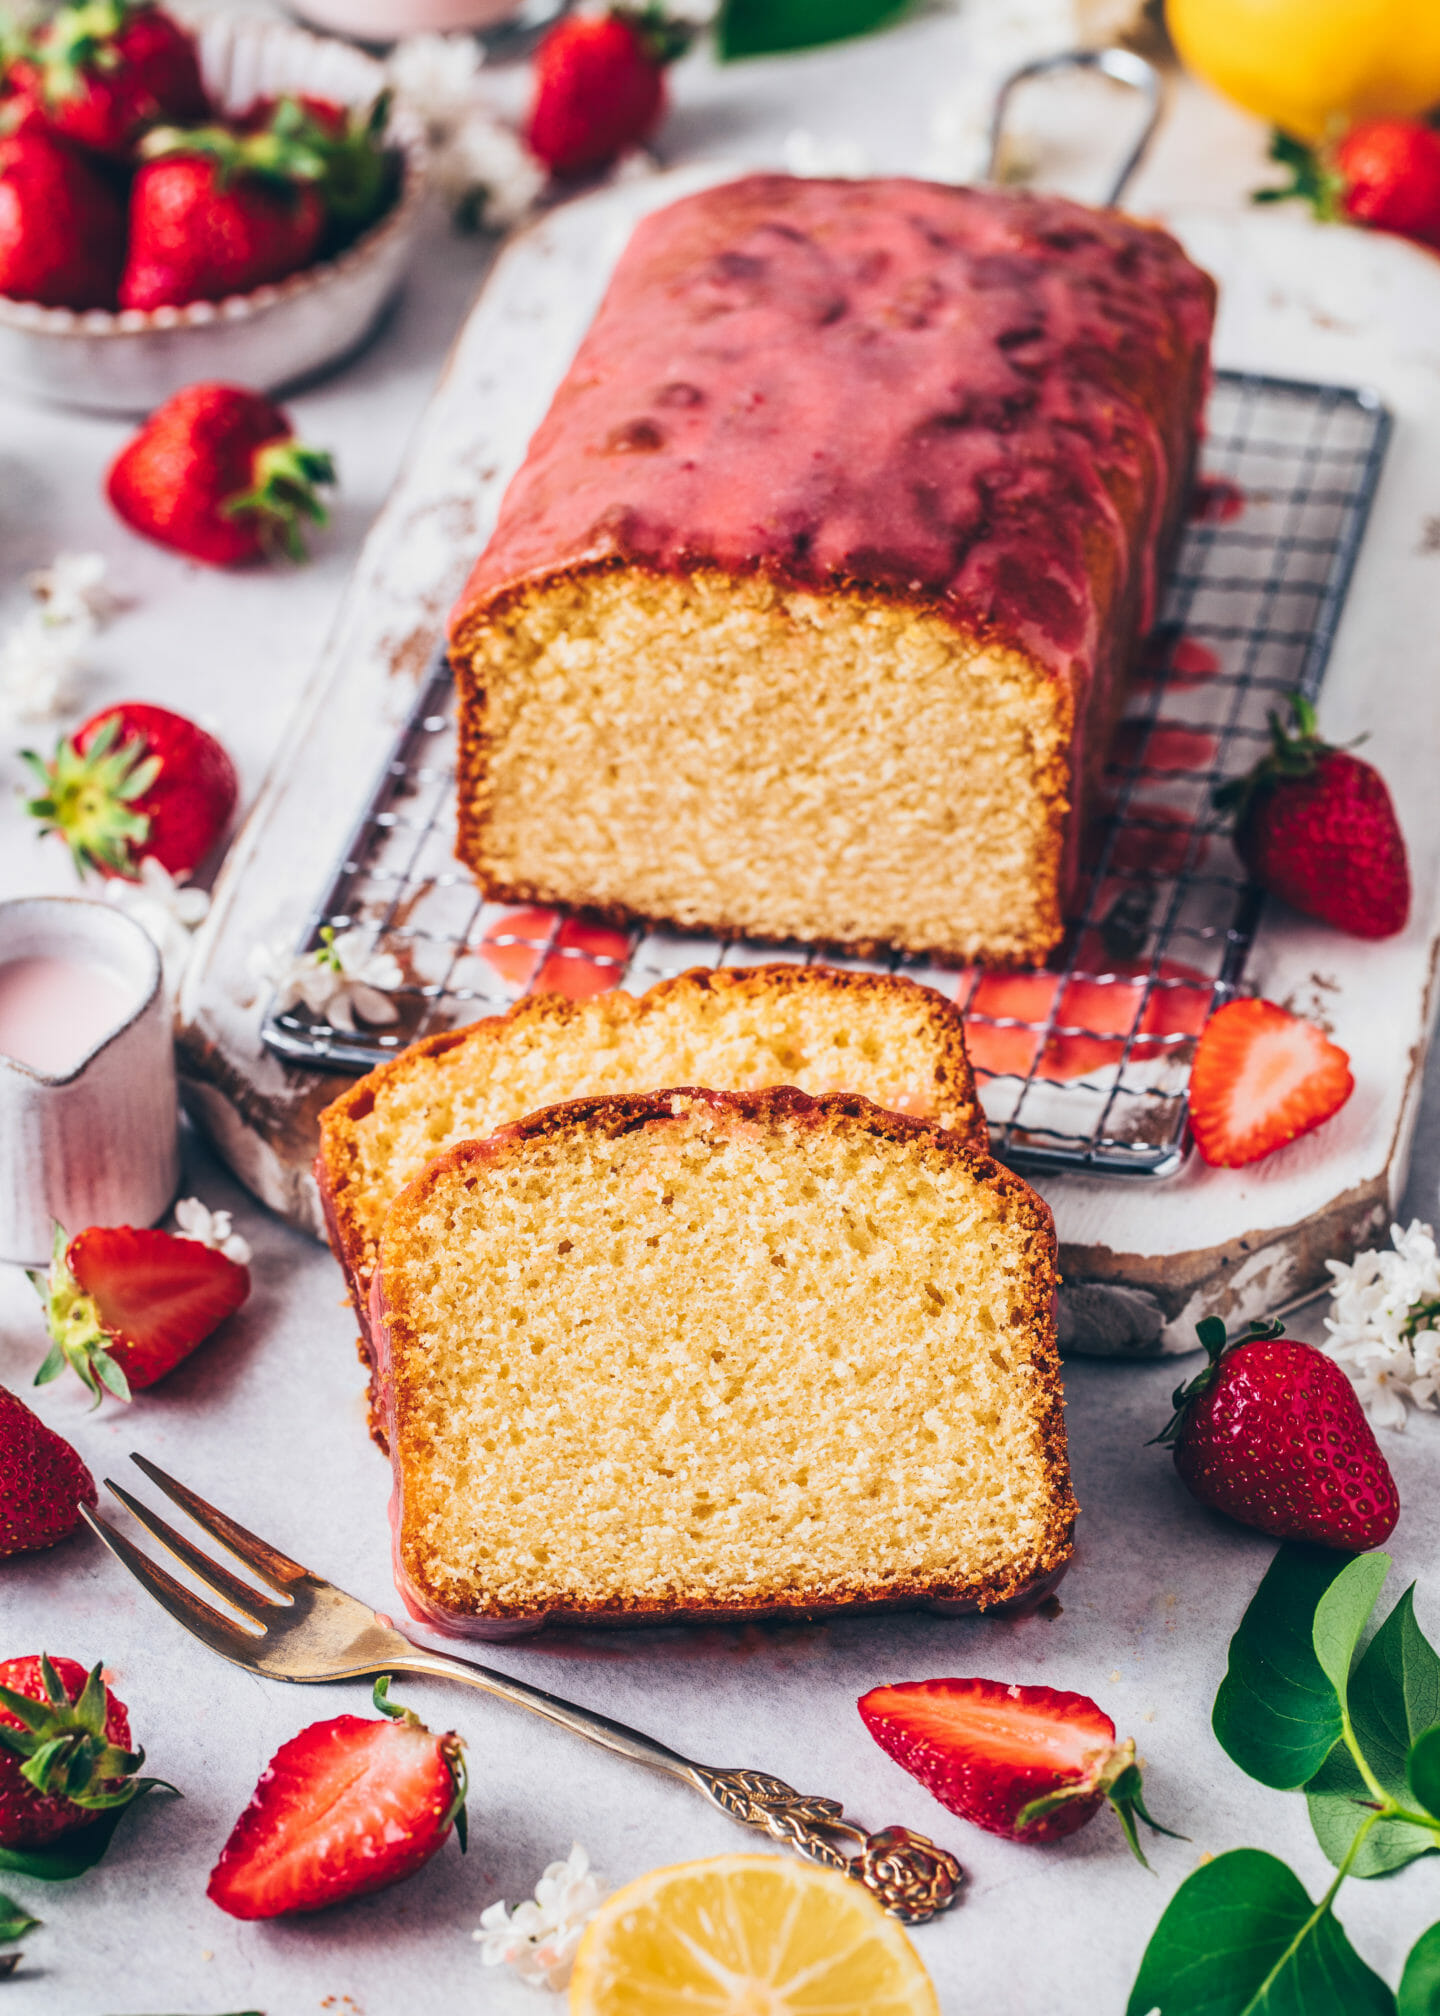 Best Vegan Lemon Cake (Strawberry Loaf)